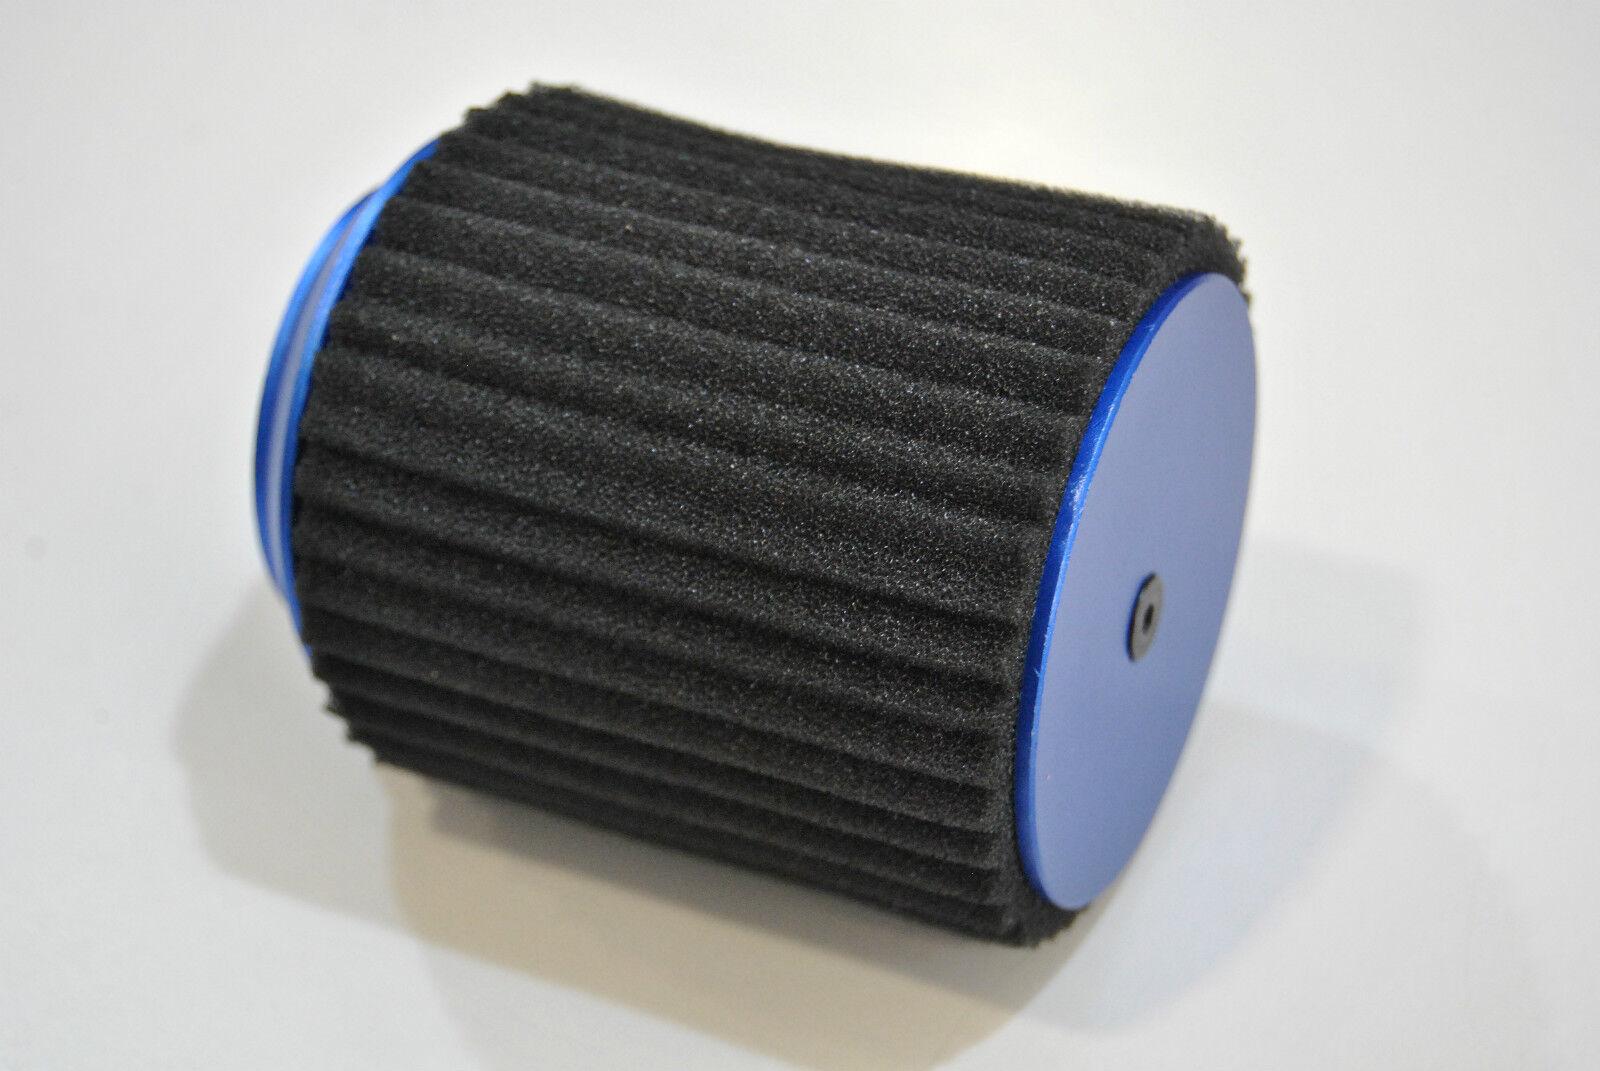 05040 filtre luft himoto aluminium 1   5   himoto luftfilter - seite 18